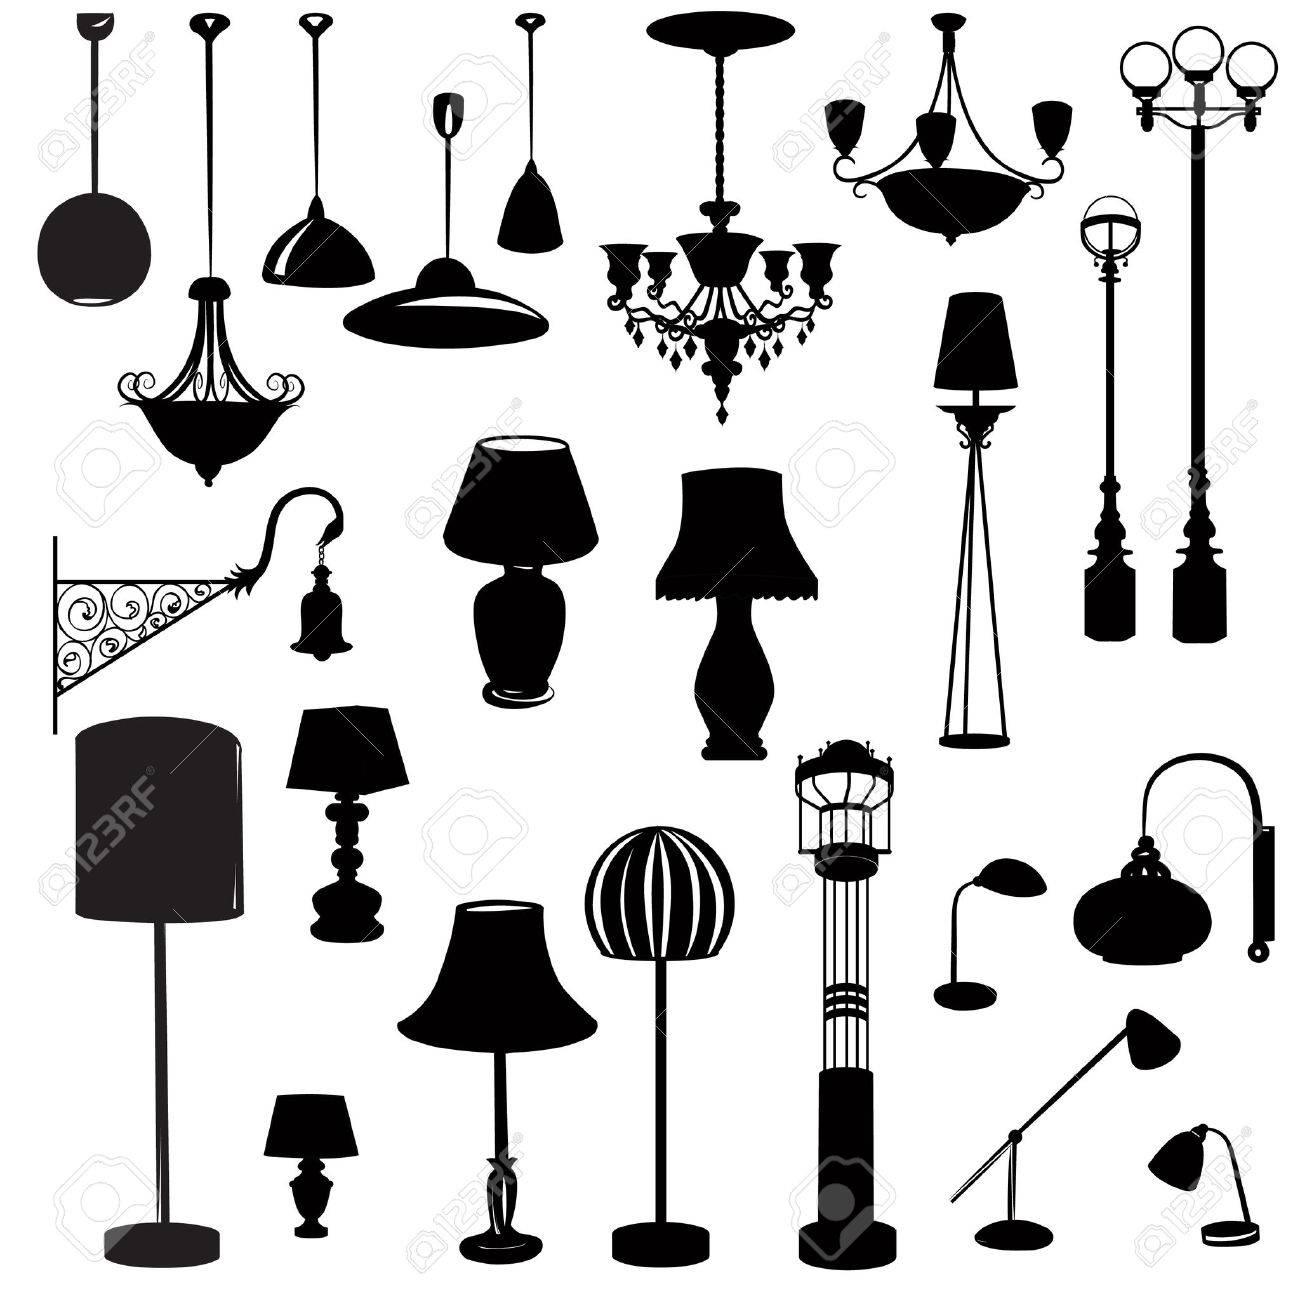 Interieur meubilair pictogrammen. plafondlamp icon set. silhouette ...